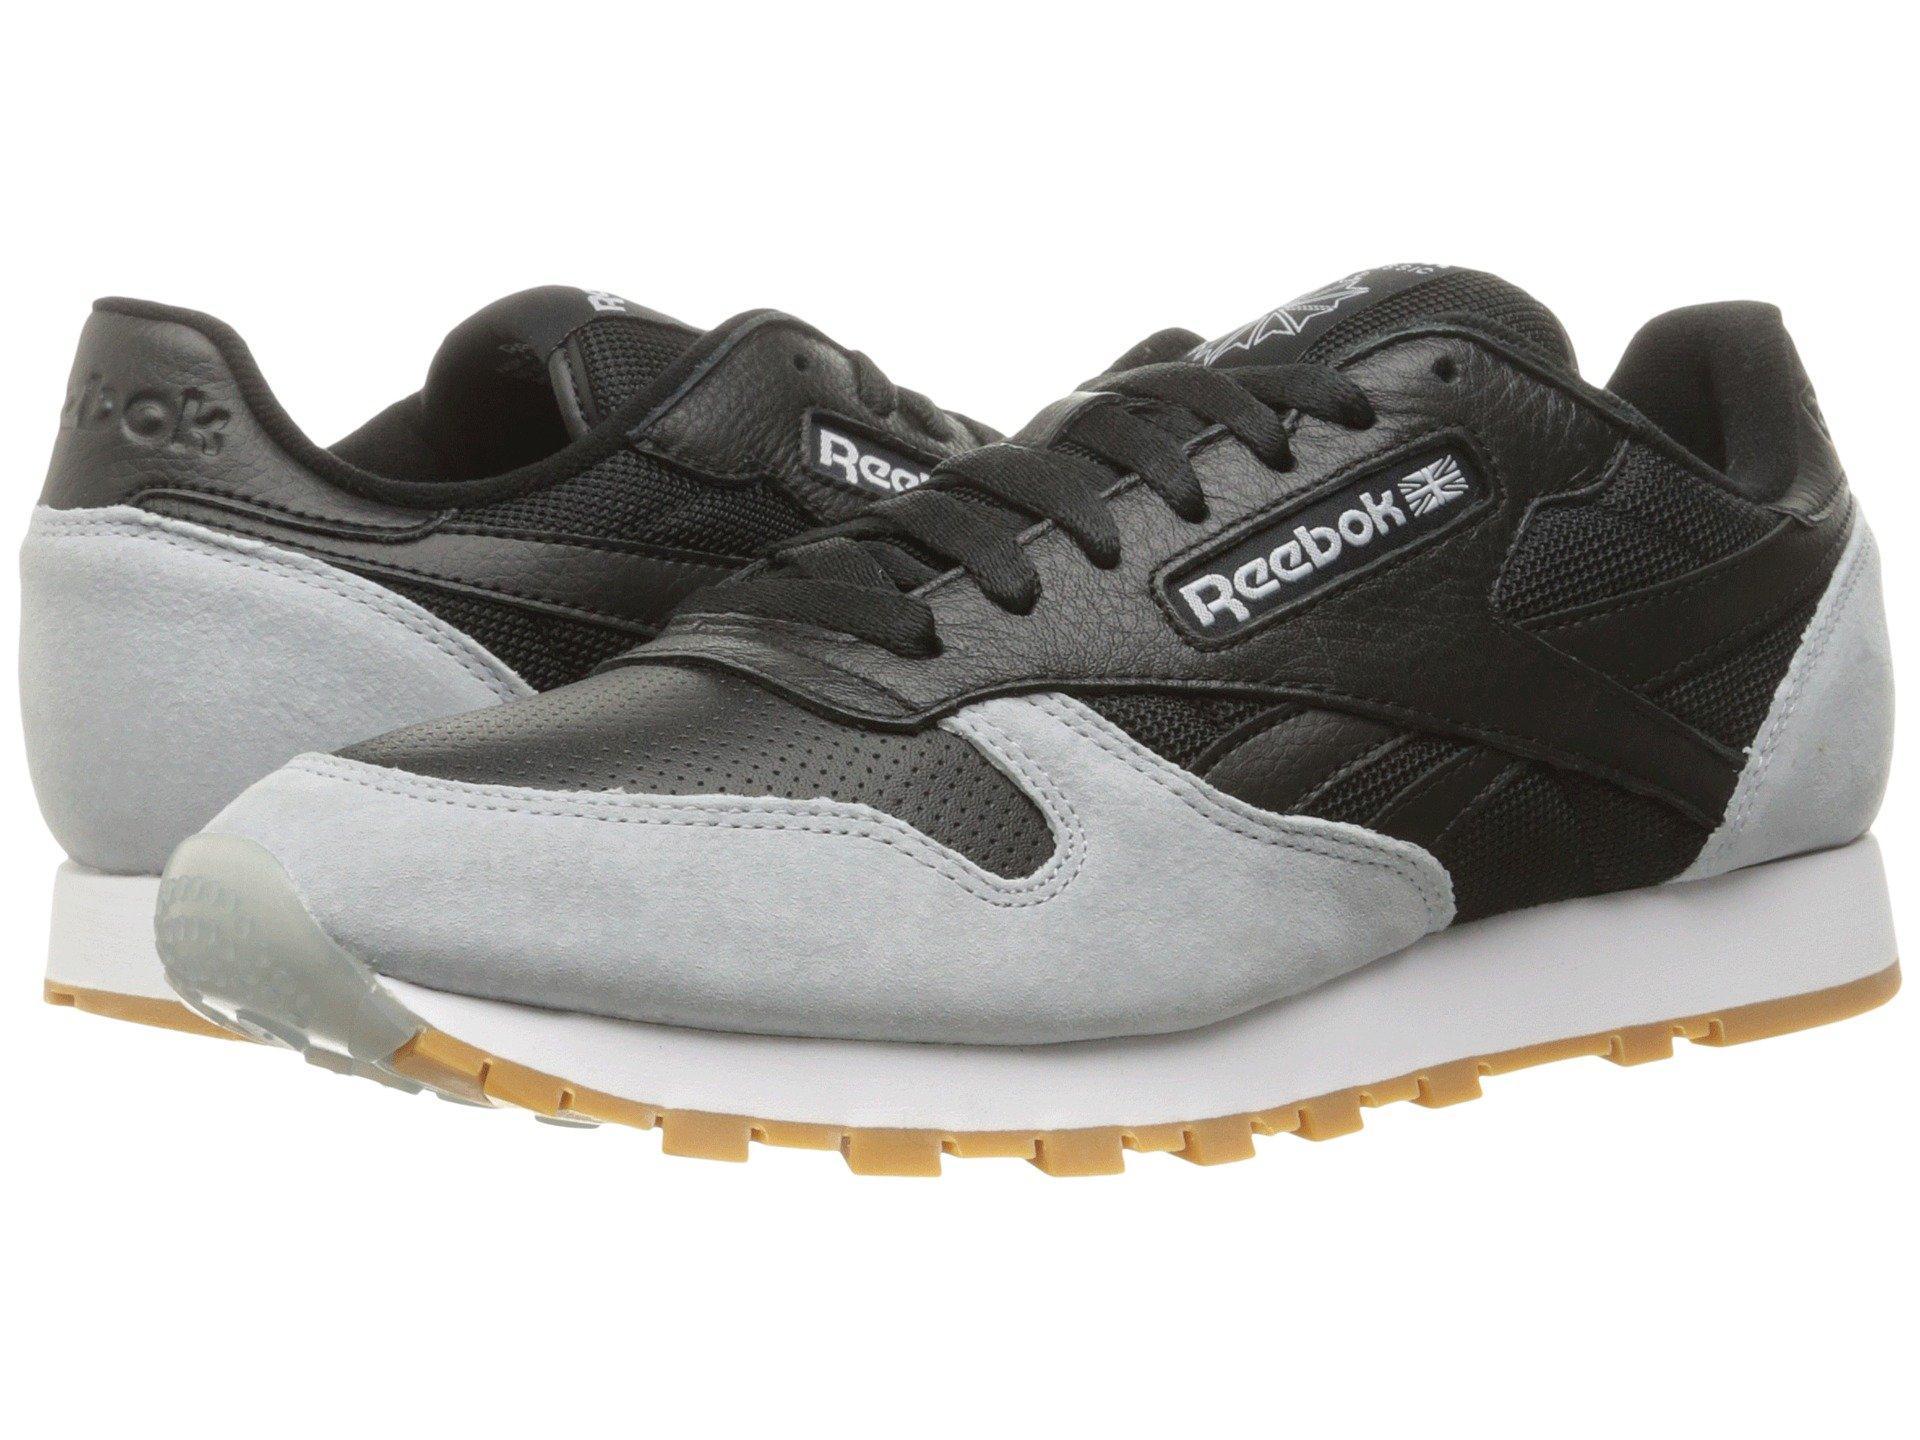 a7df19fe07d Reebok Classic Leather Spp In Black Cloud Grey Gum